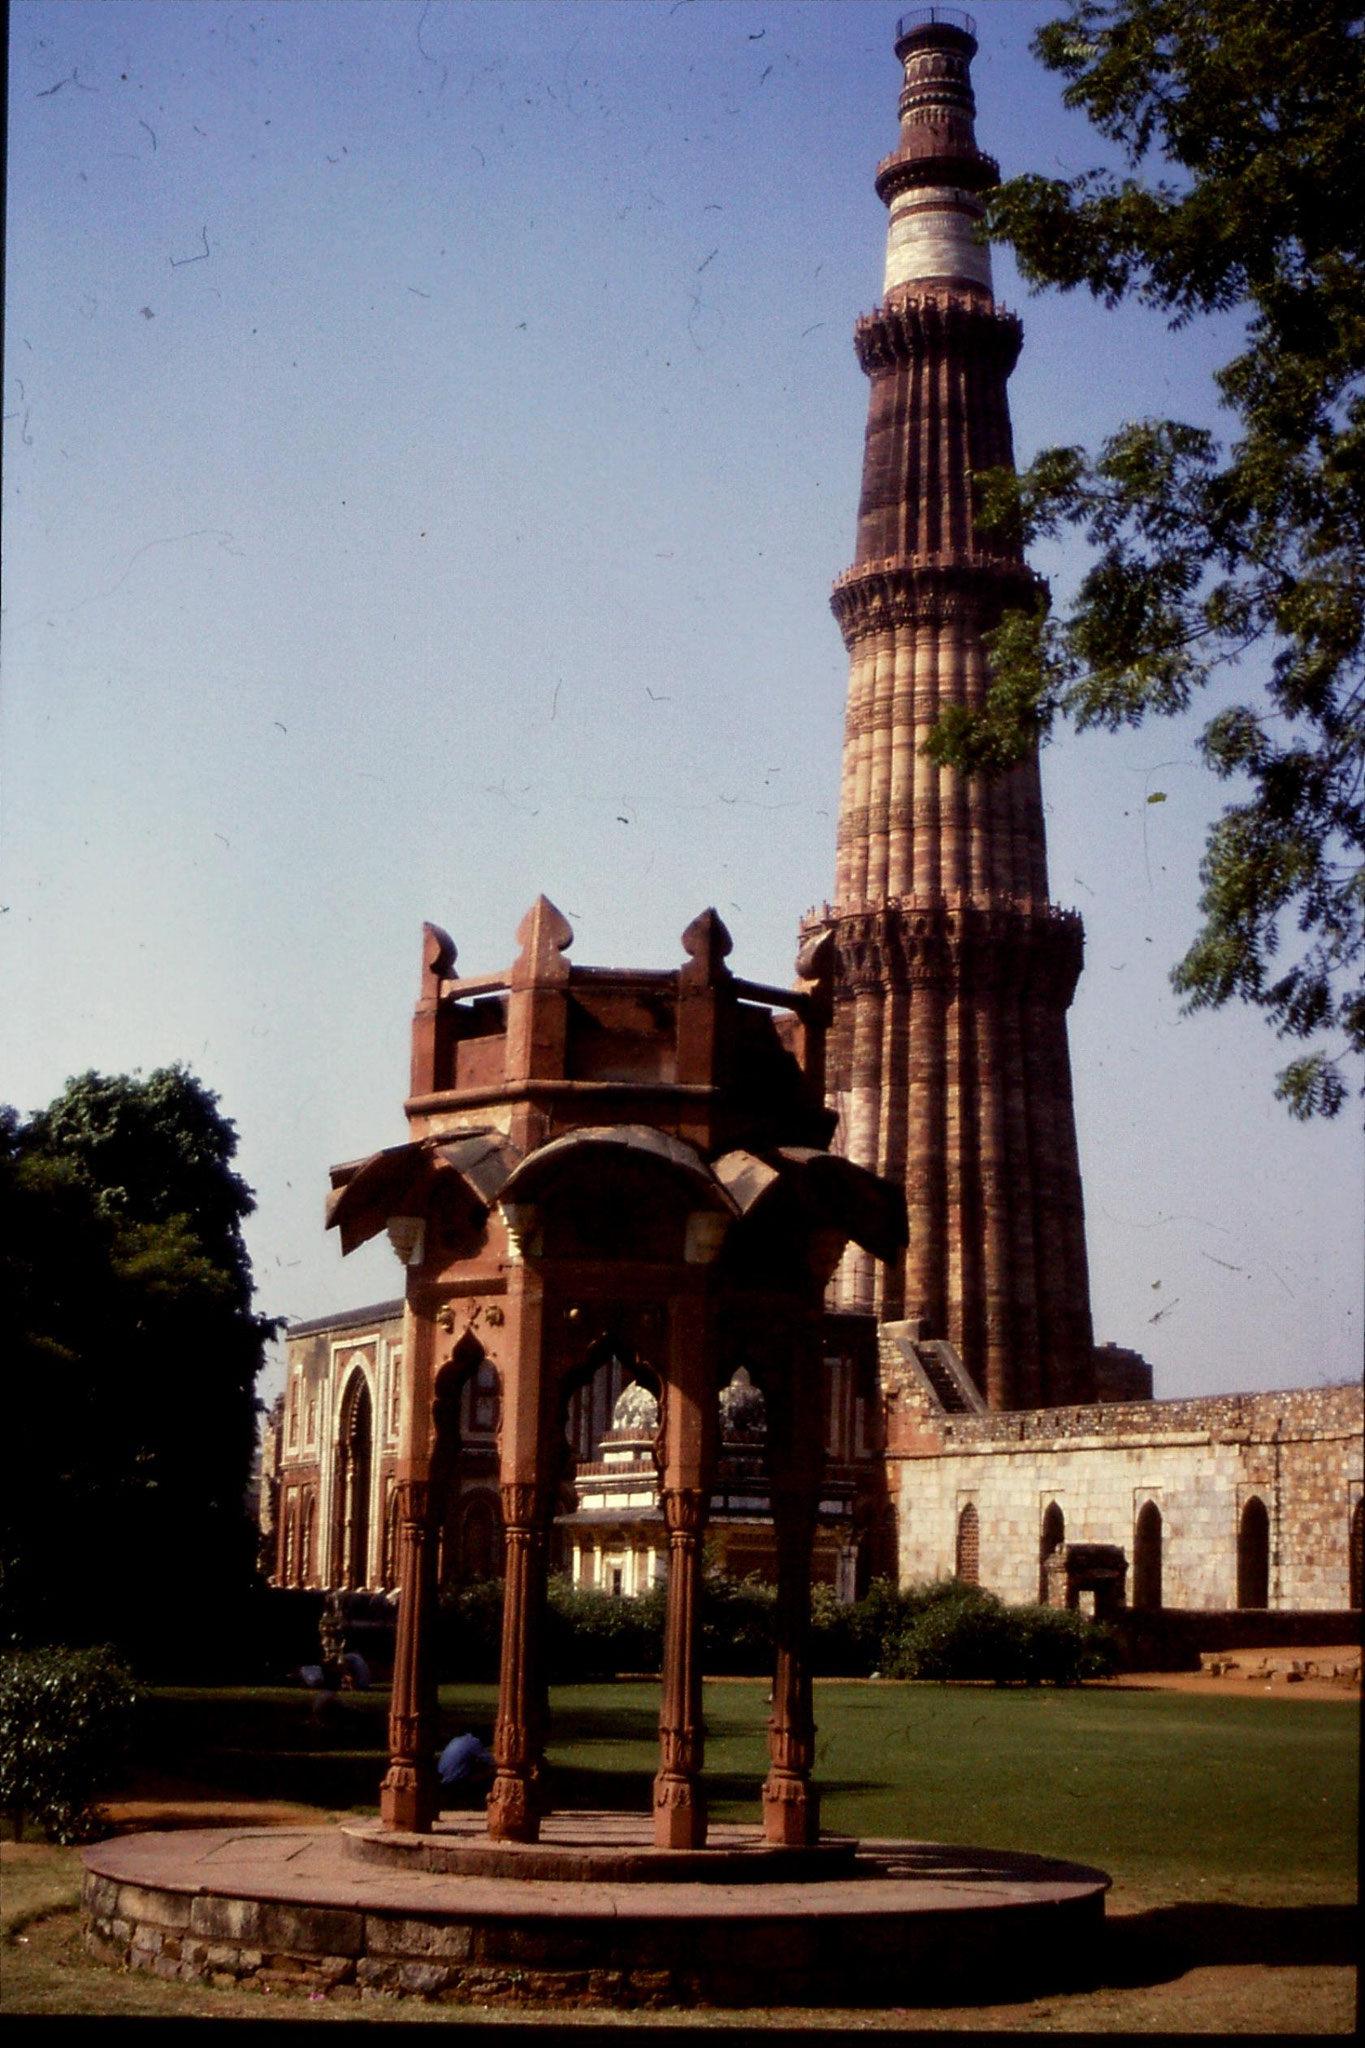 21/11/1989: 19: Delhi Qutab Minar tower